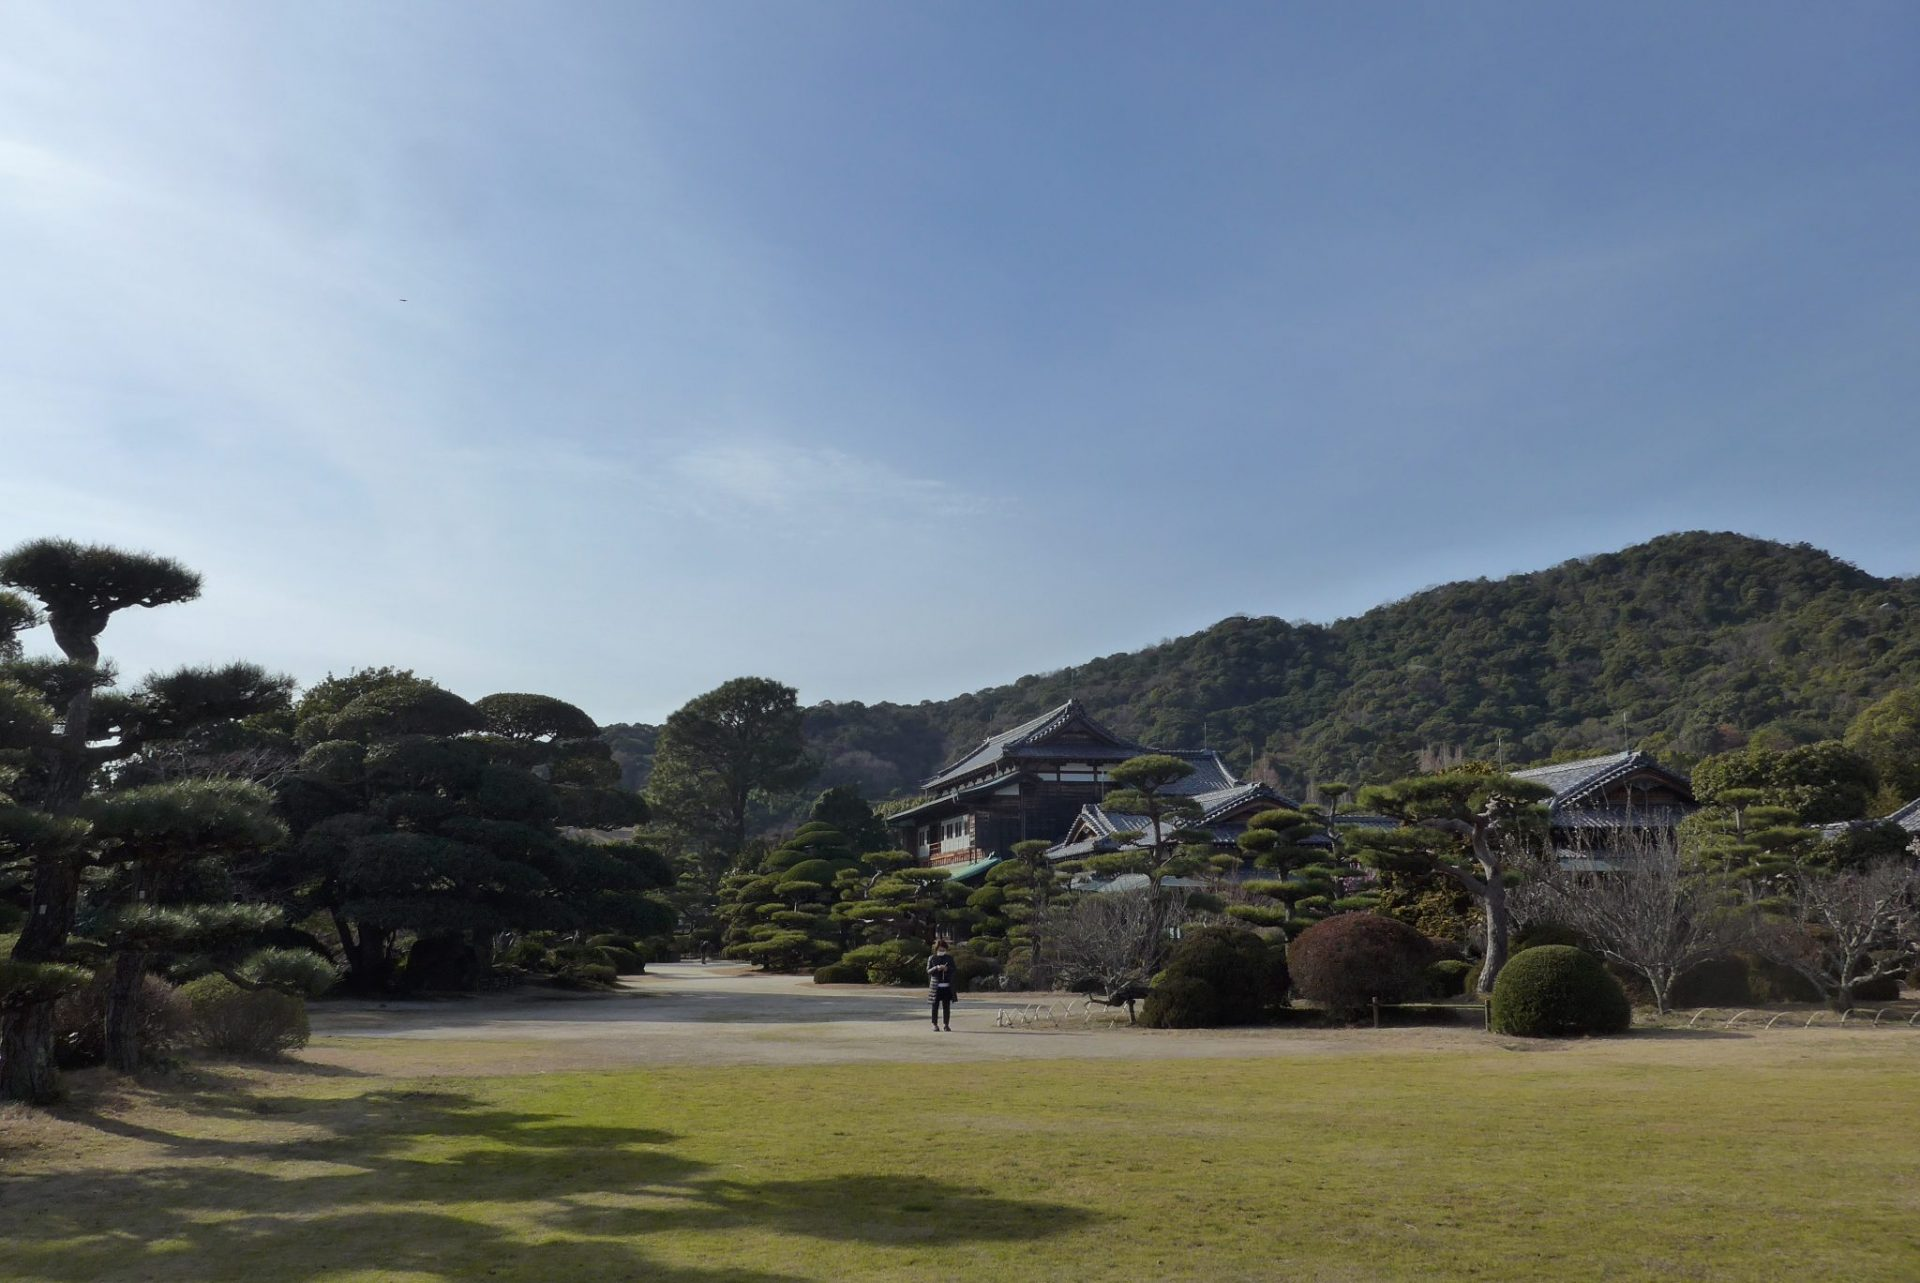 (K)山口県防府市にある毛利氏庭園〜無料の駐車場が完備され便利